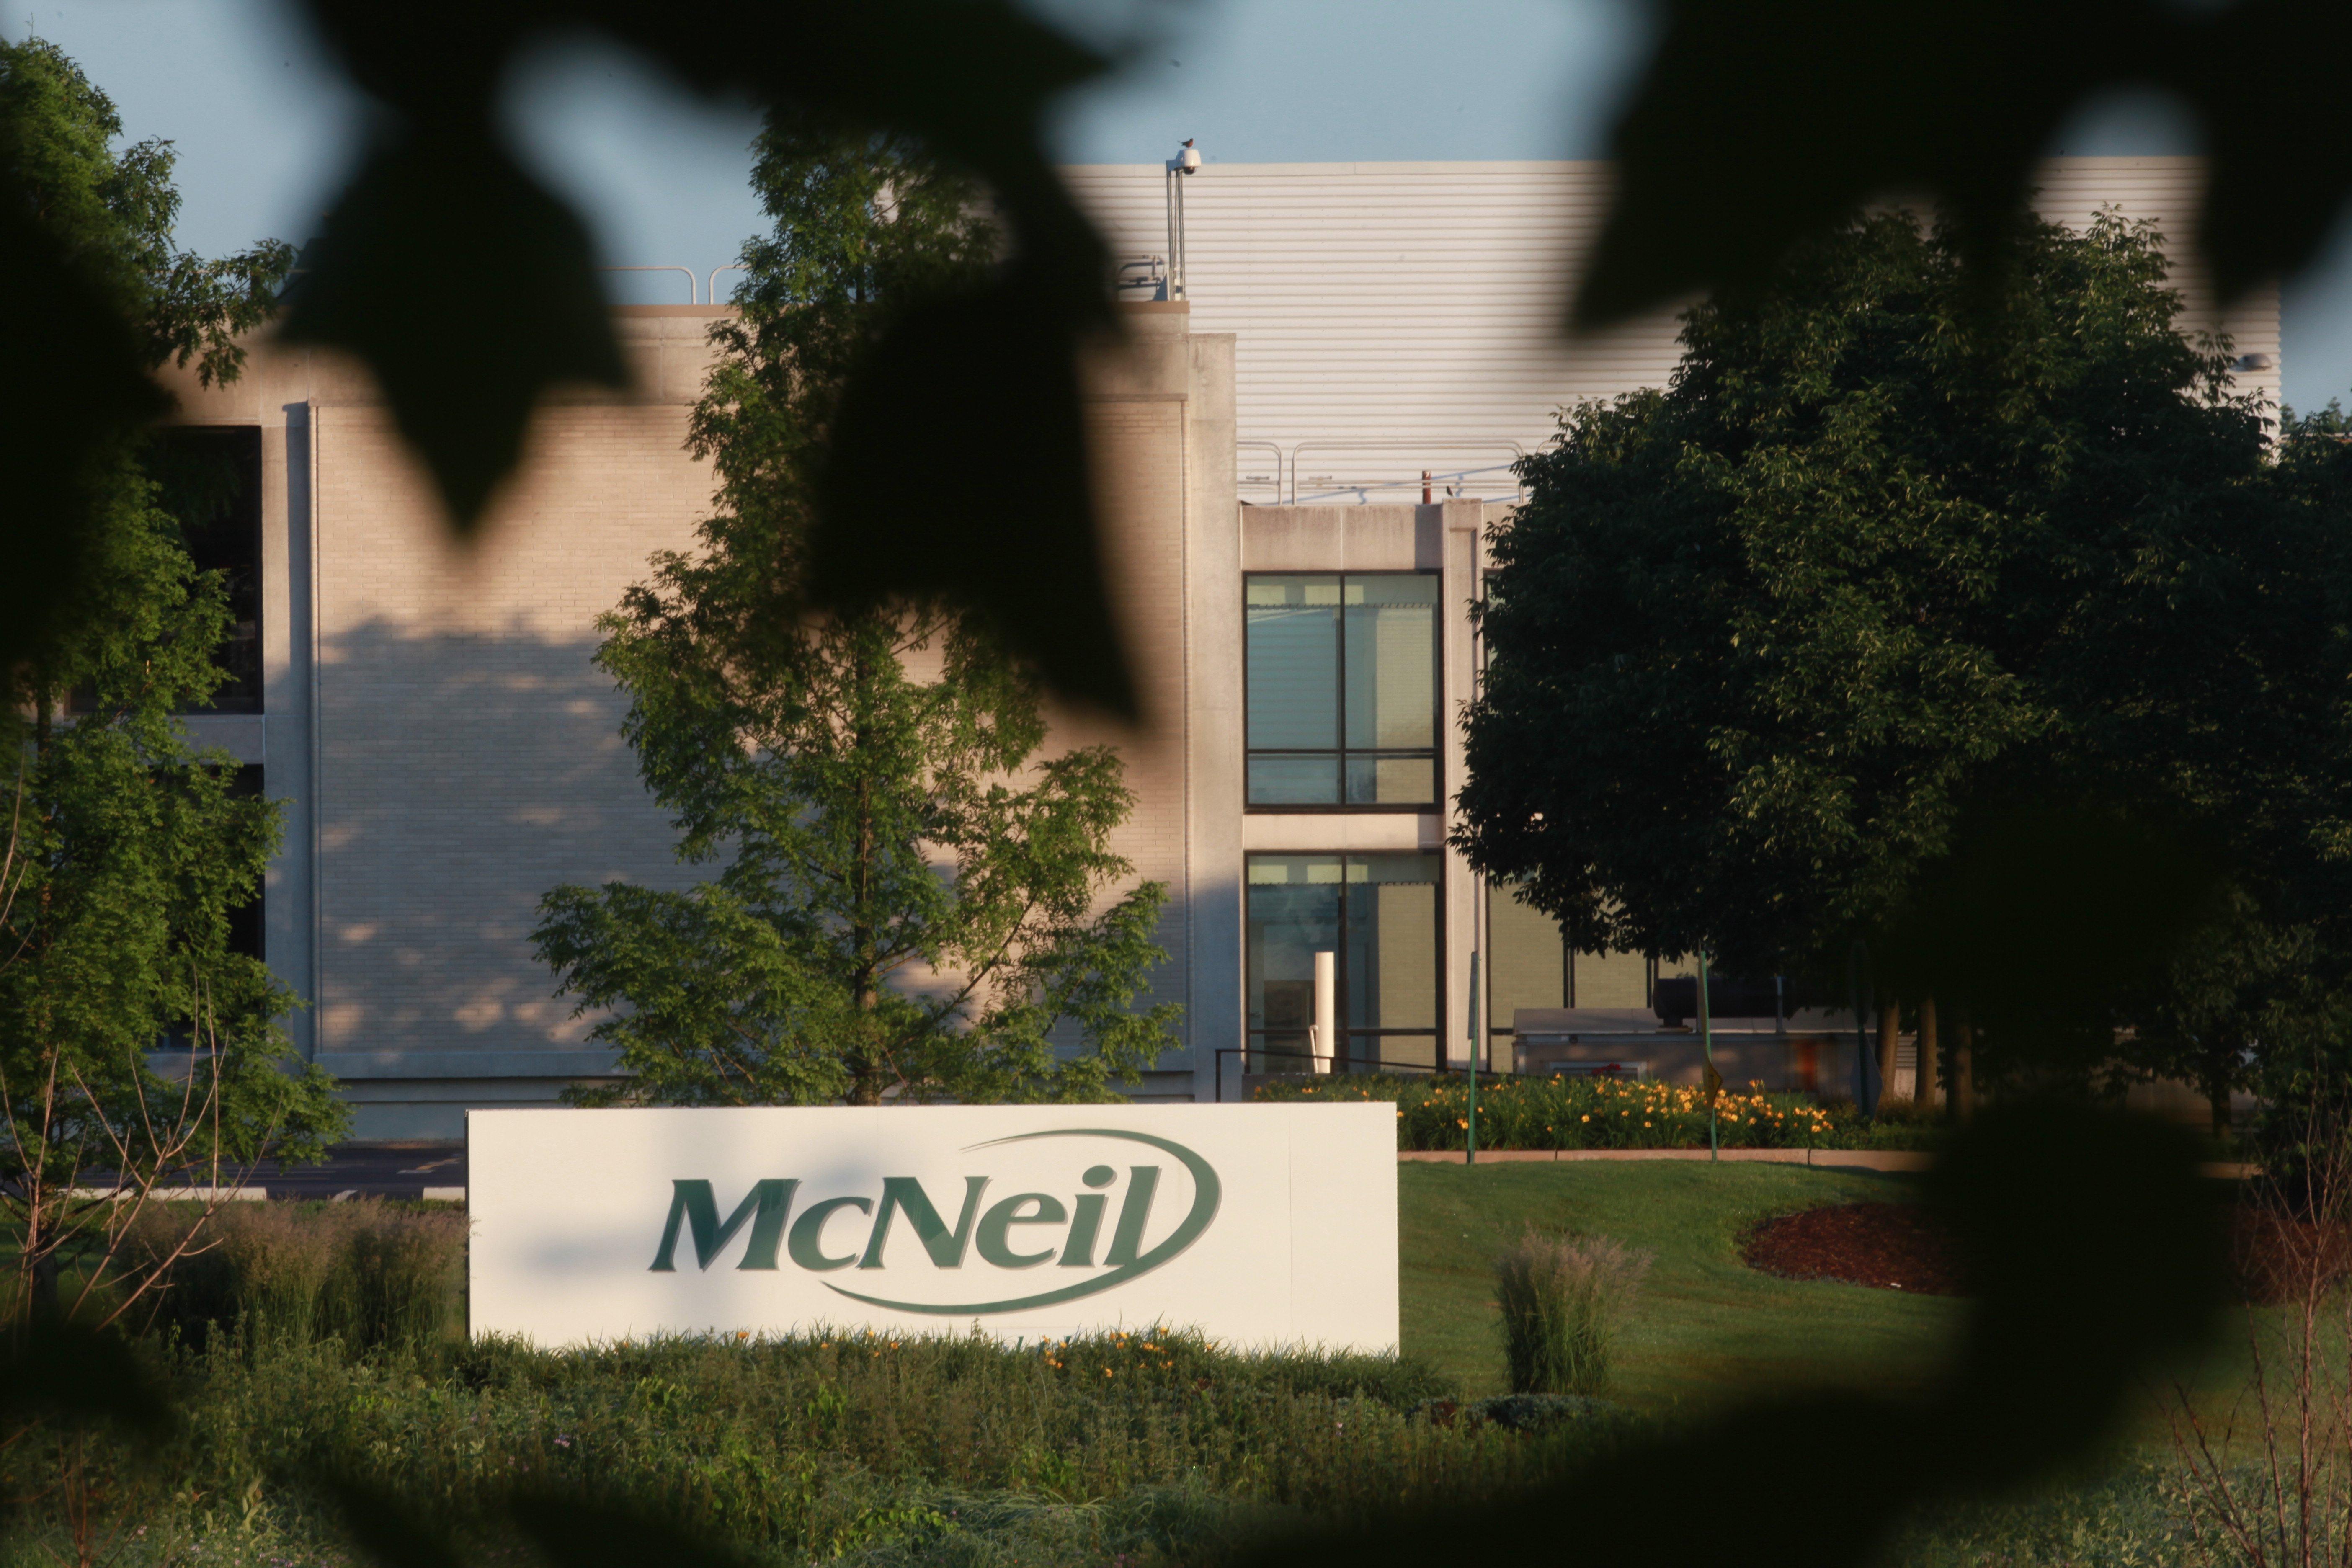 Mcneil Photo